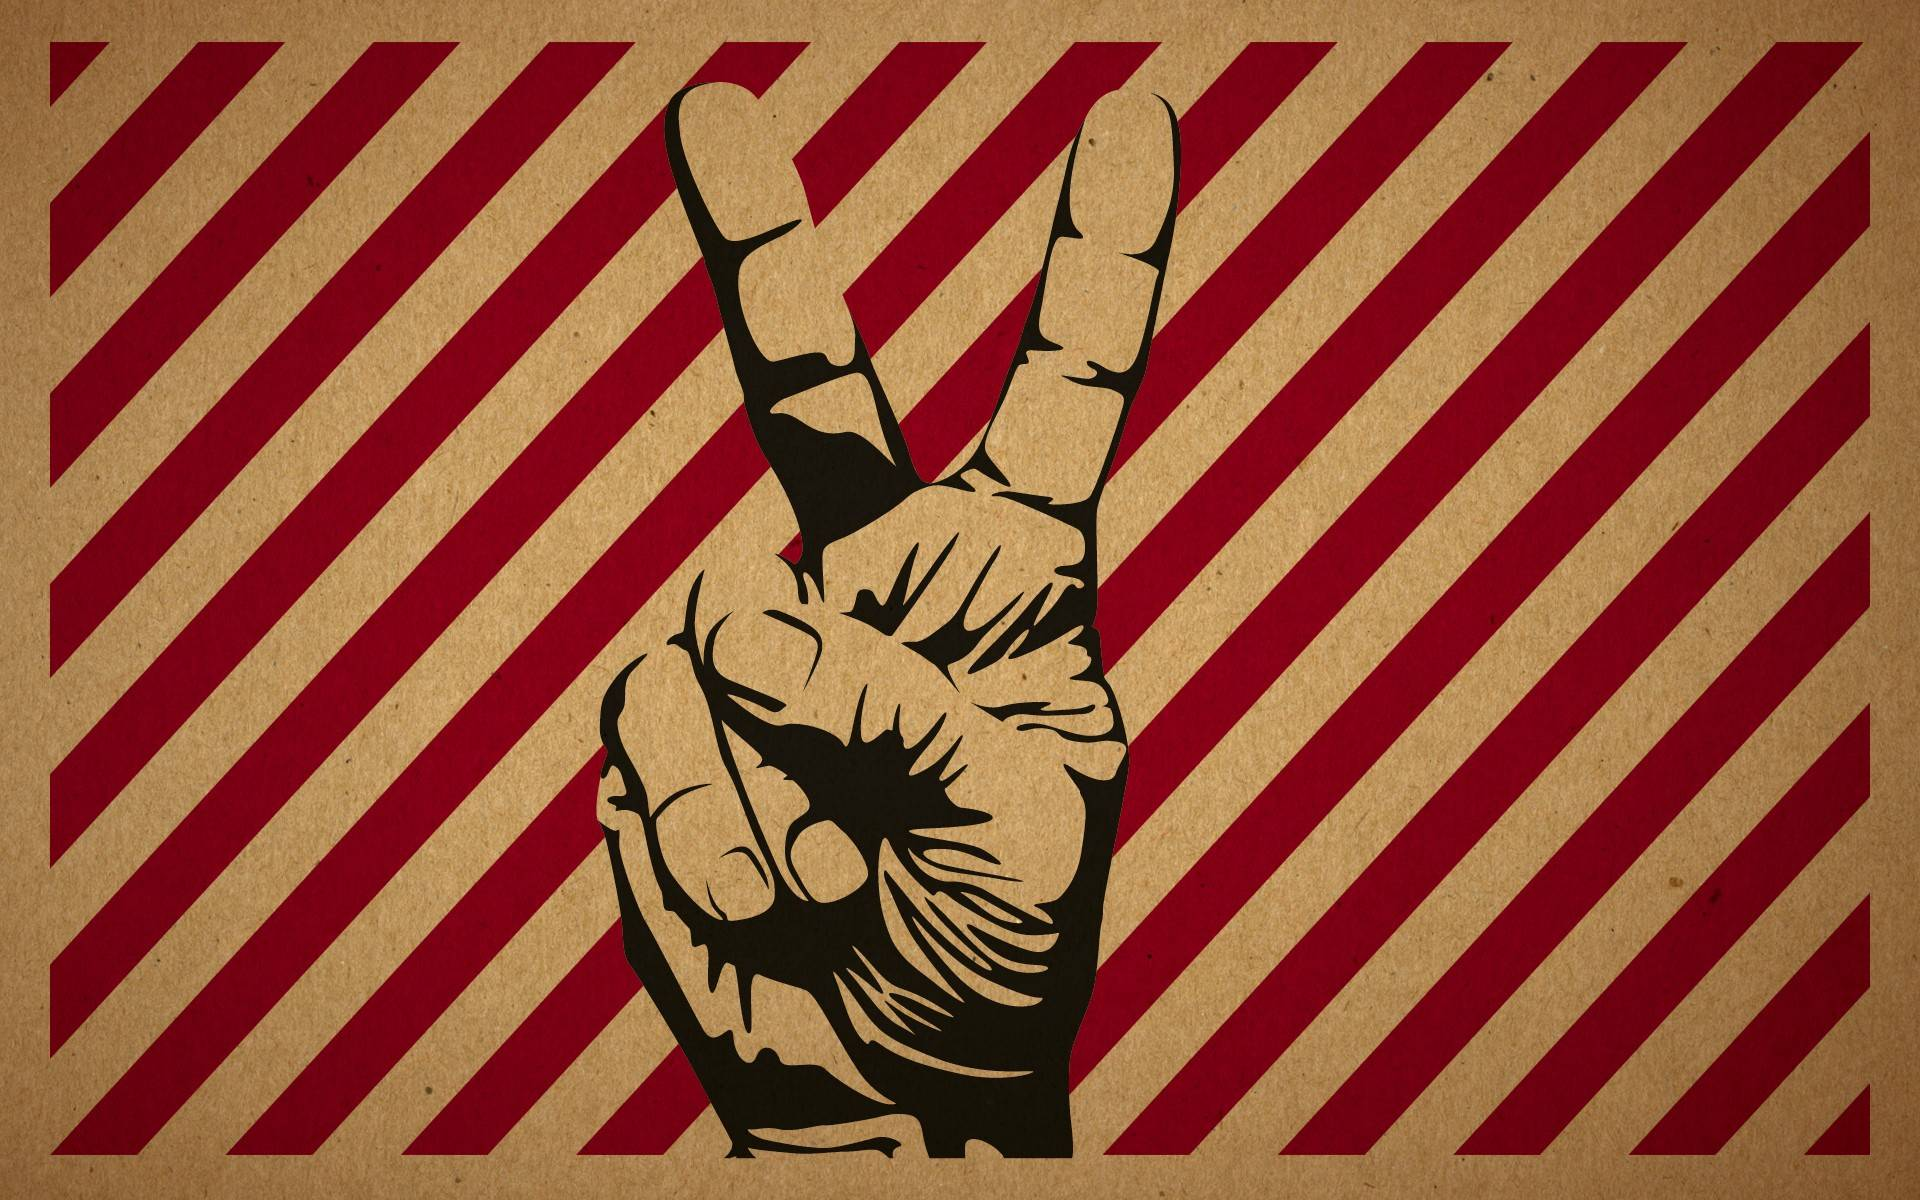 Hands Peace 19201200 Wallpaper 2201934 1920x1200